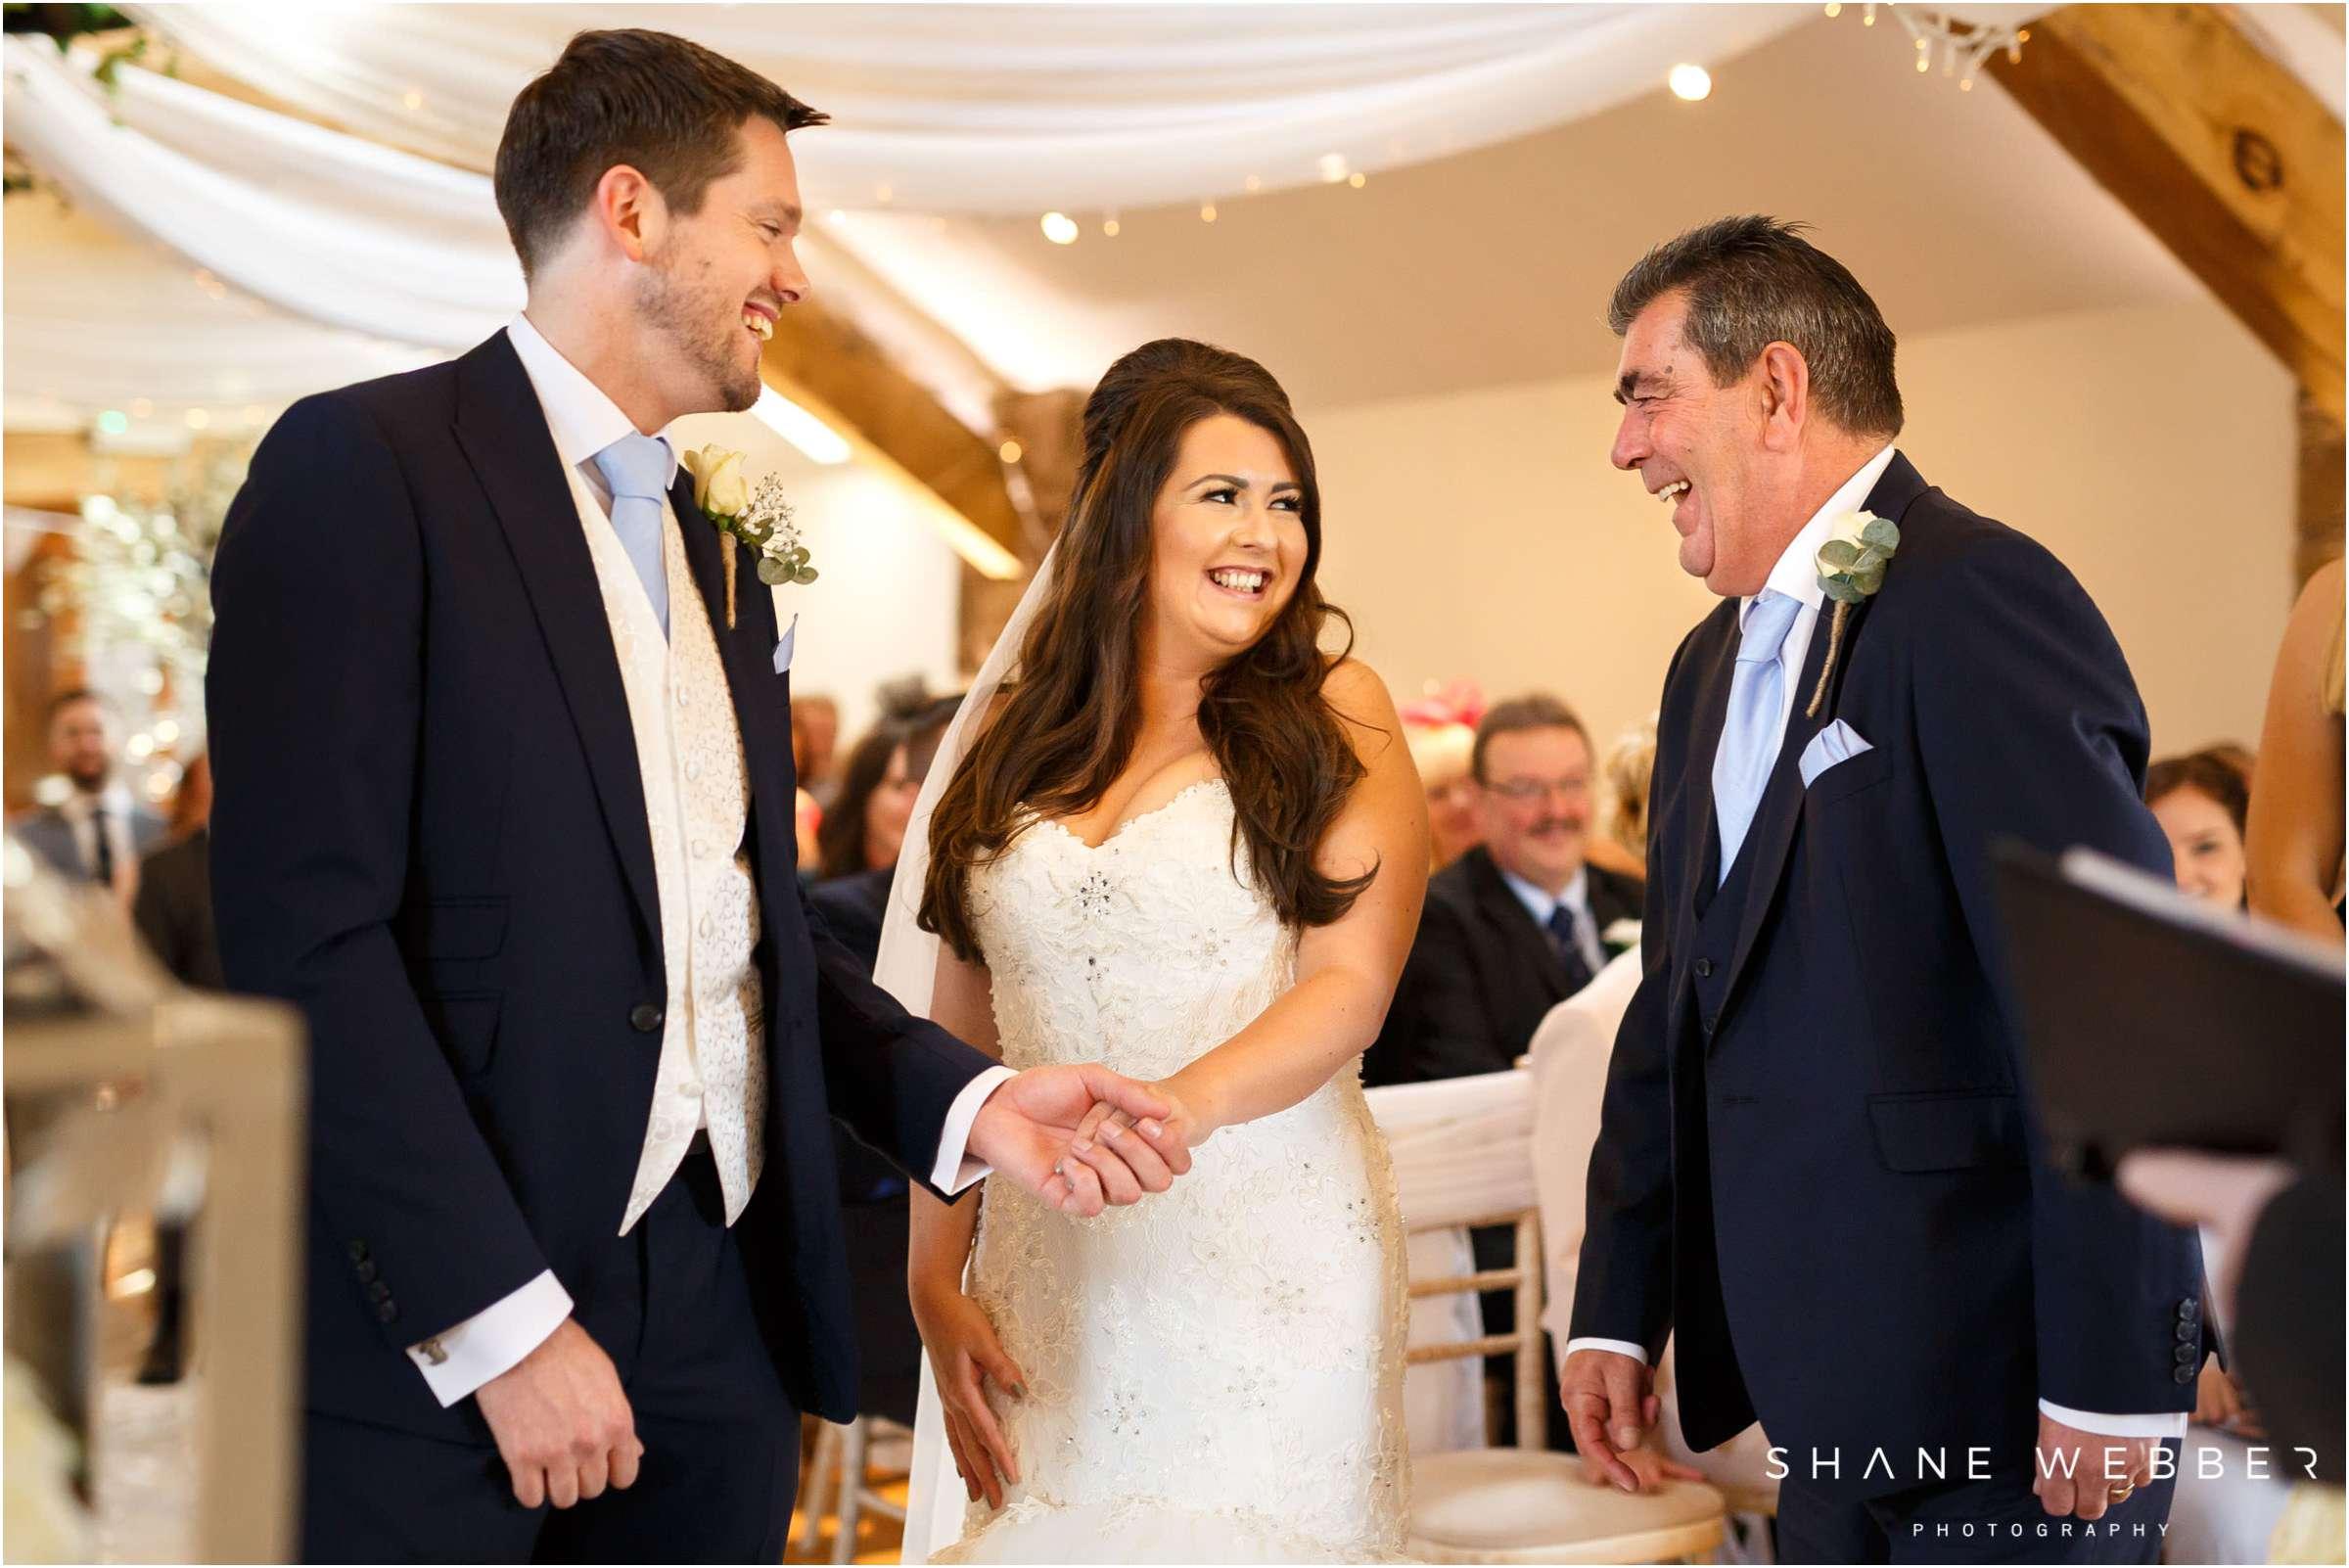 bright and natural wedding photography